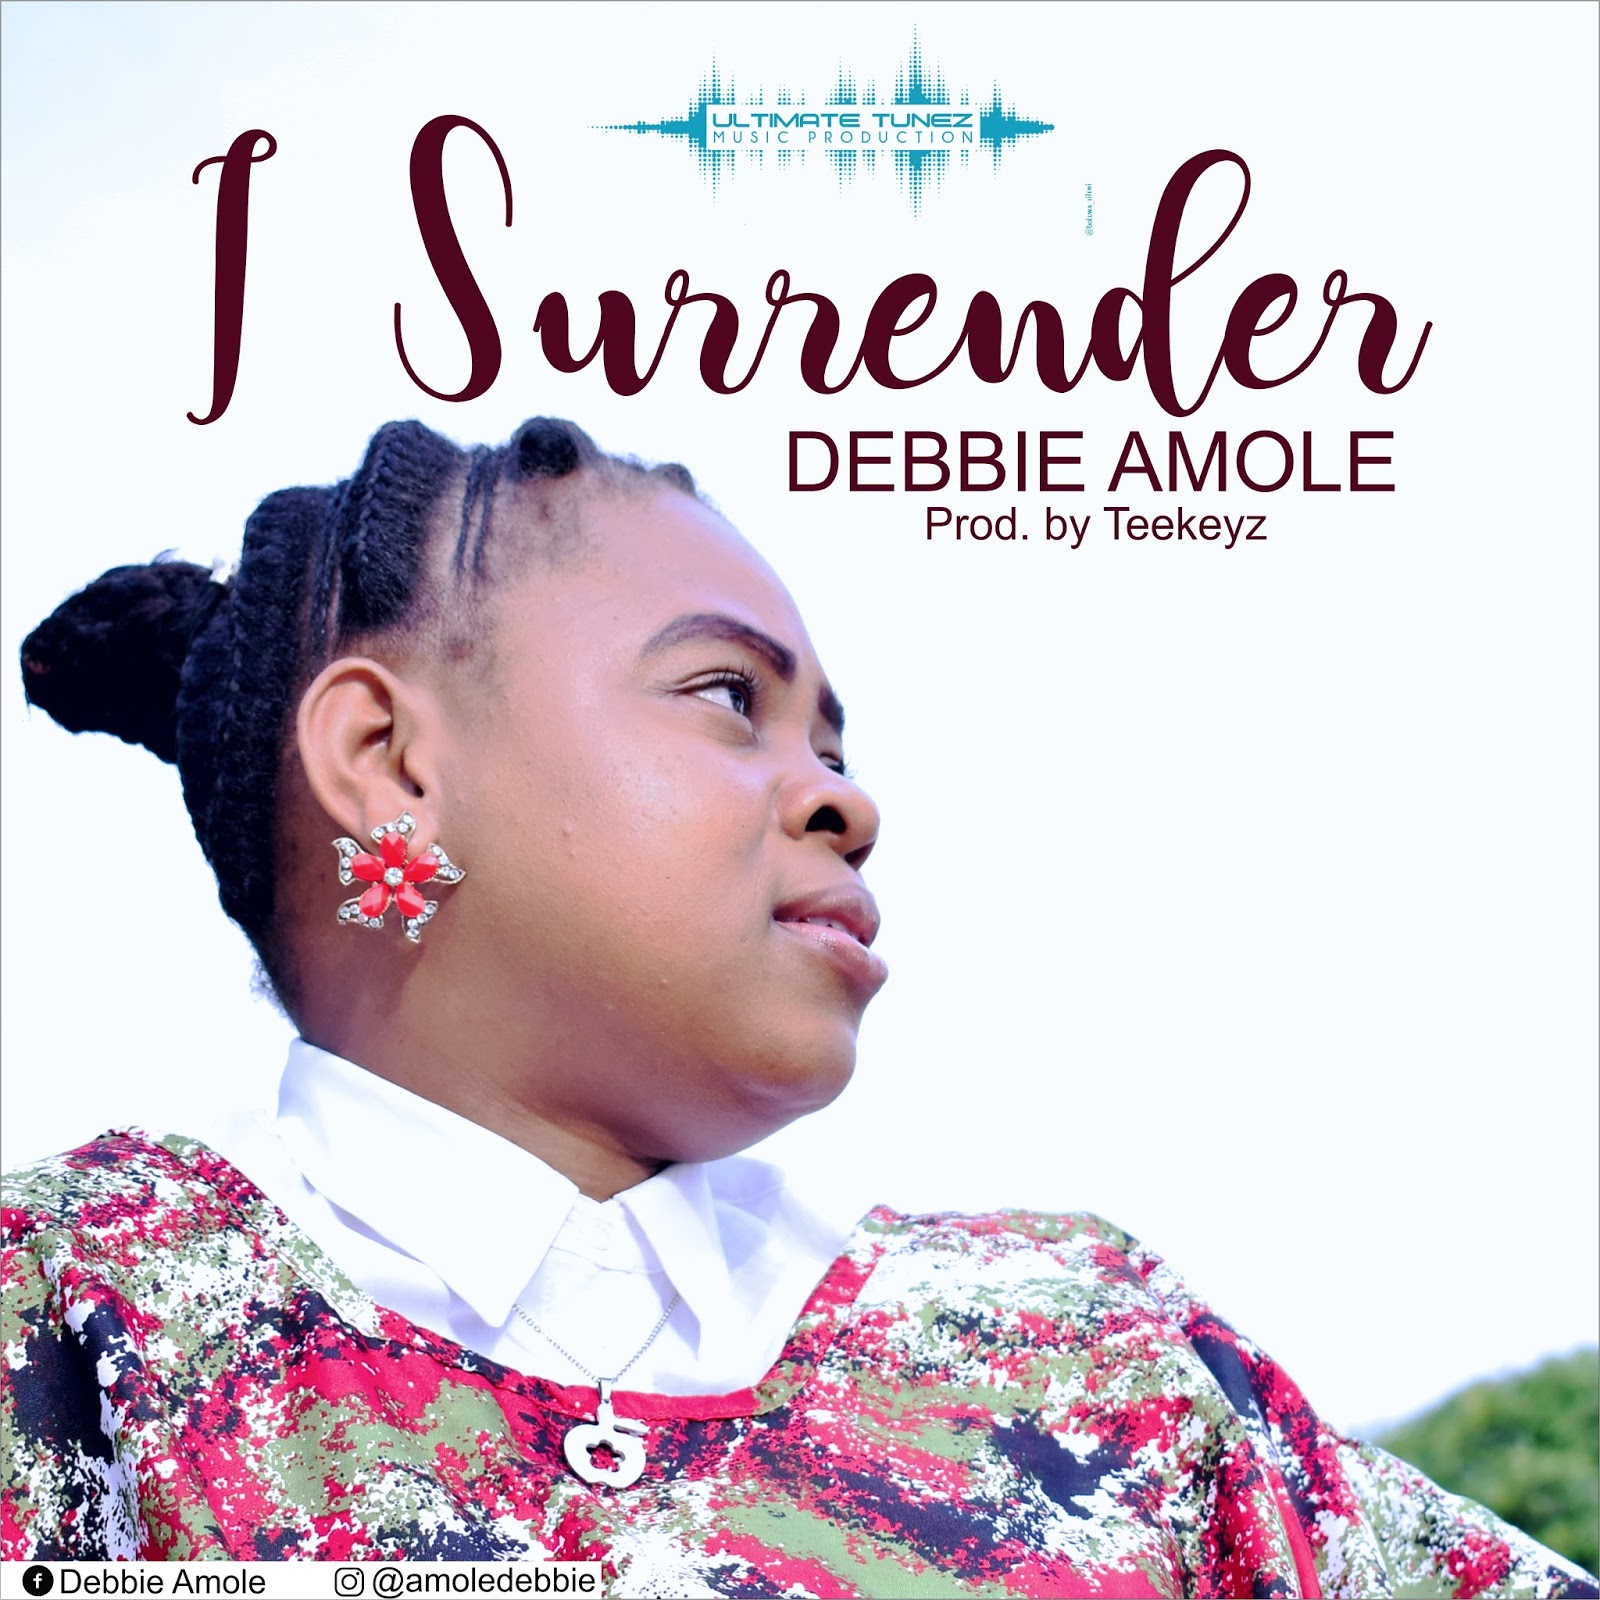 I Surrender by Debbie Amole. Songs download. Gospel Redefined